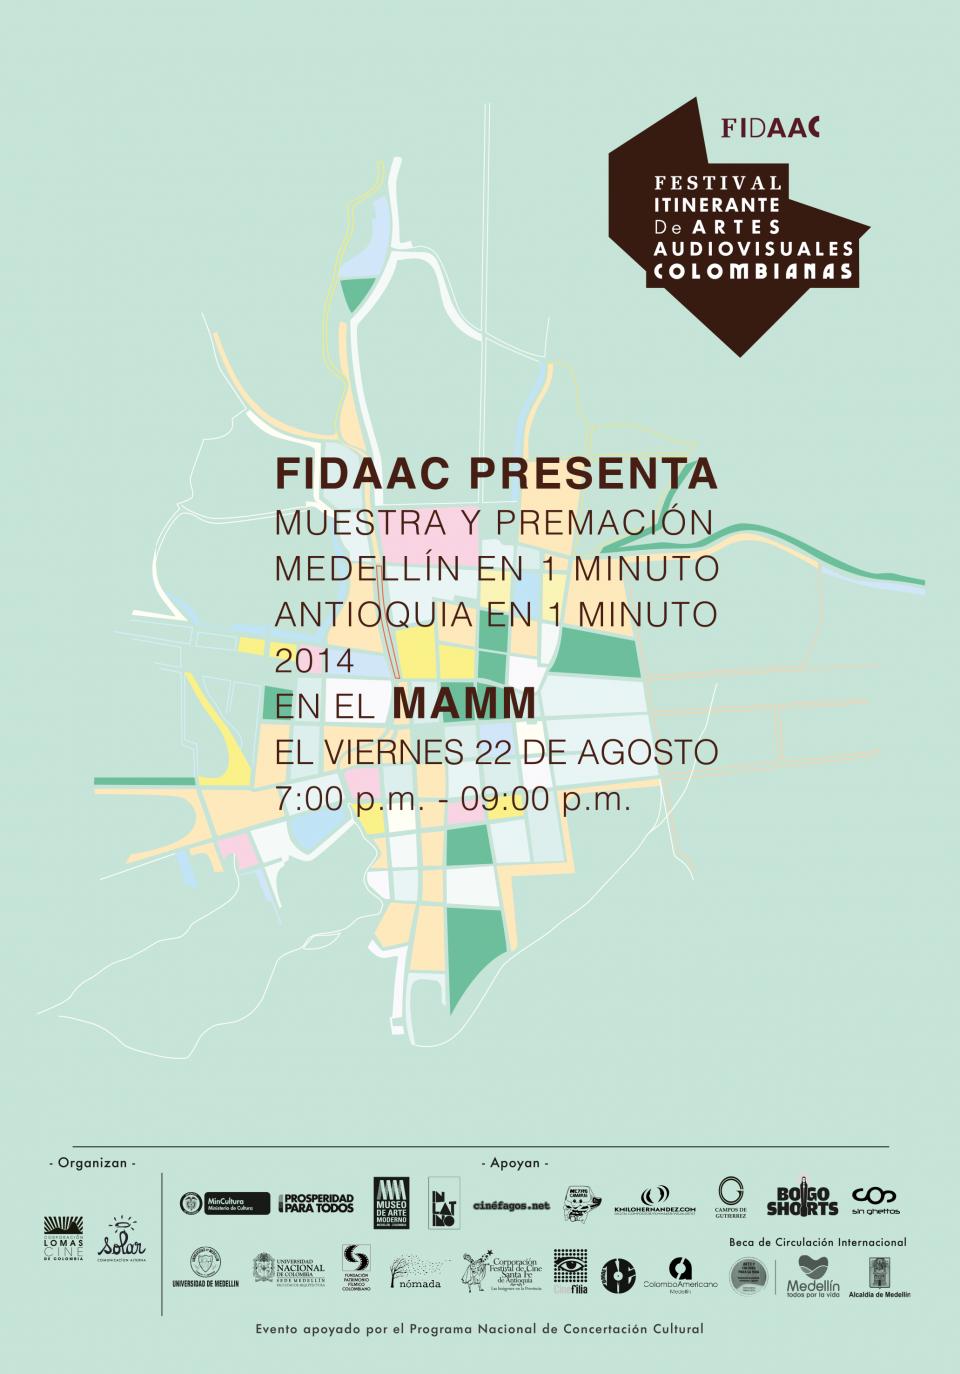 Affiche FIDAAC 2014